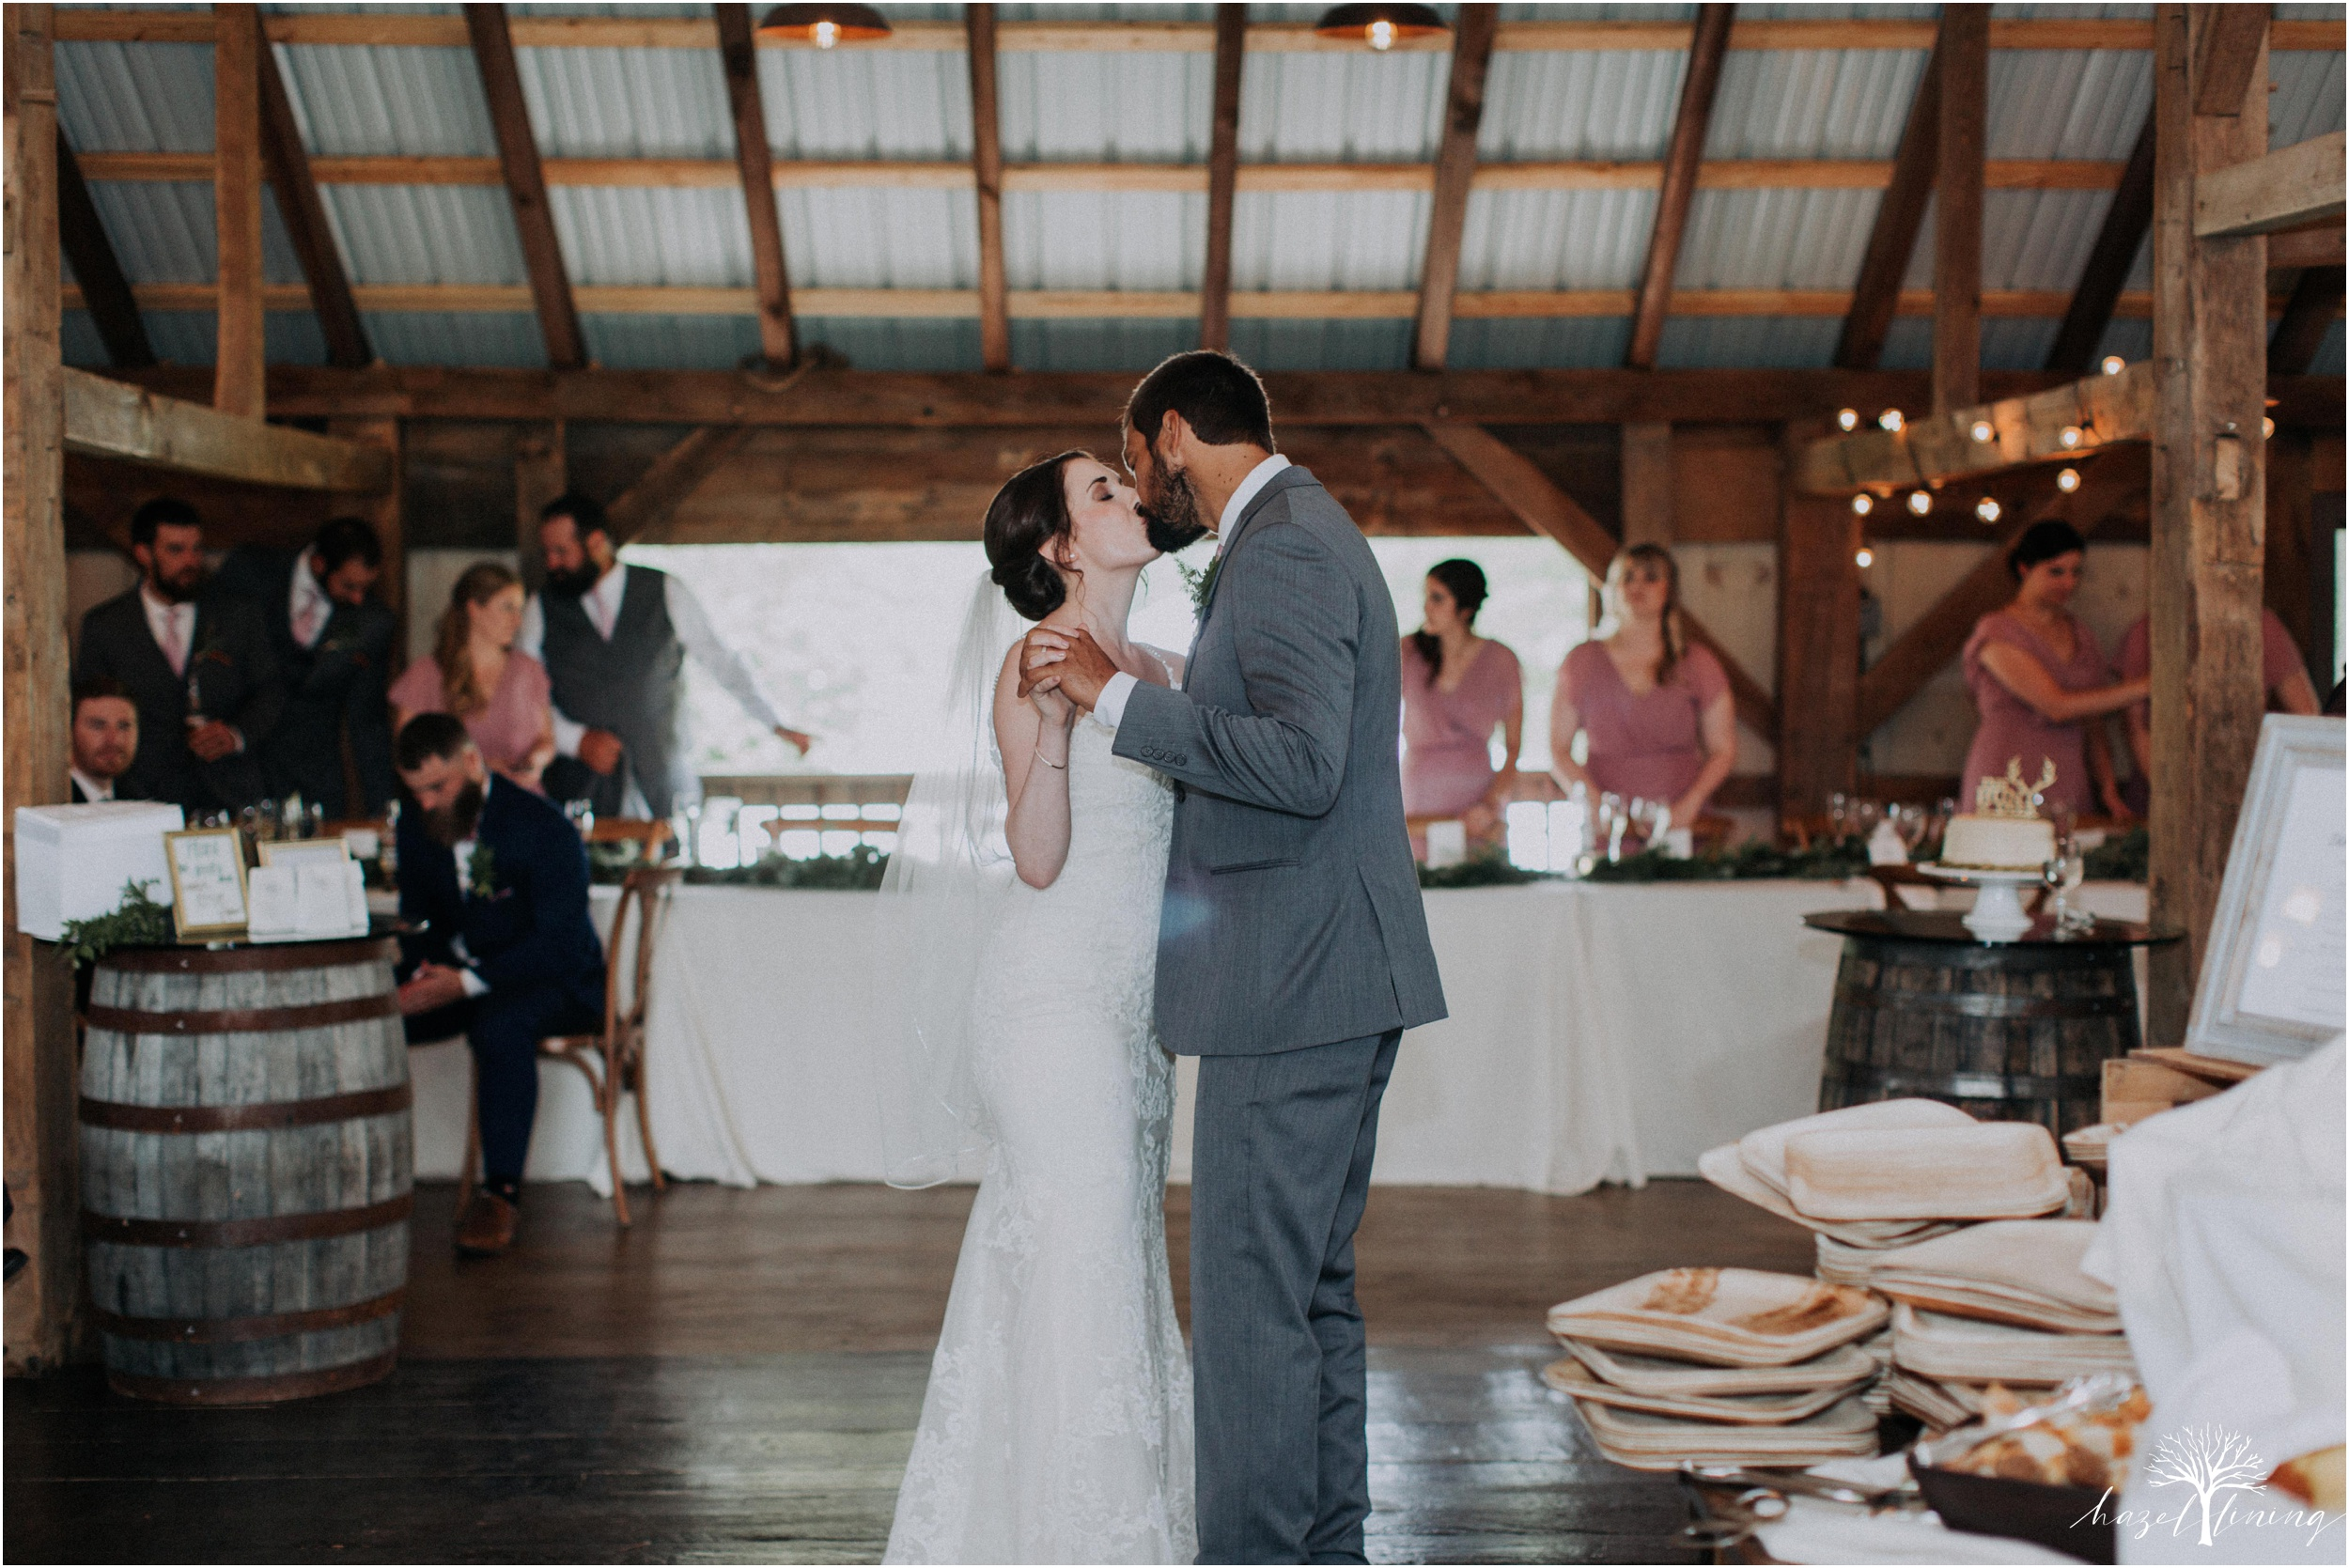 hazel-lining-travel-wedding-elopement-photography-lisa-landon-shoemaker-the-farm-bakery-and-events-bucks-county-quakertown-pennsylvania-summer-country-outdoor-farm-wedding_0113.jpg